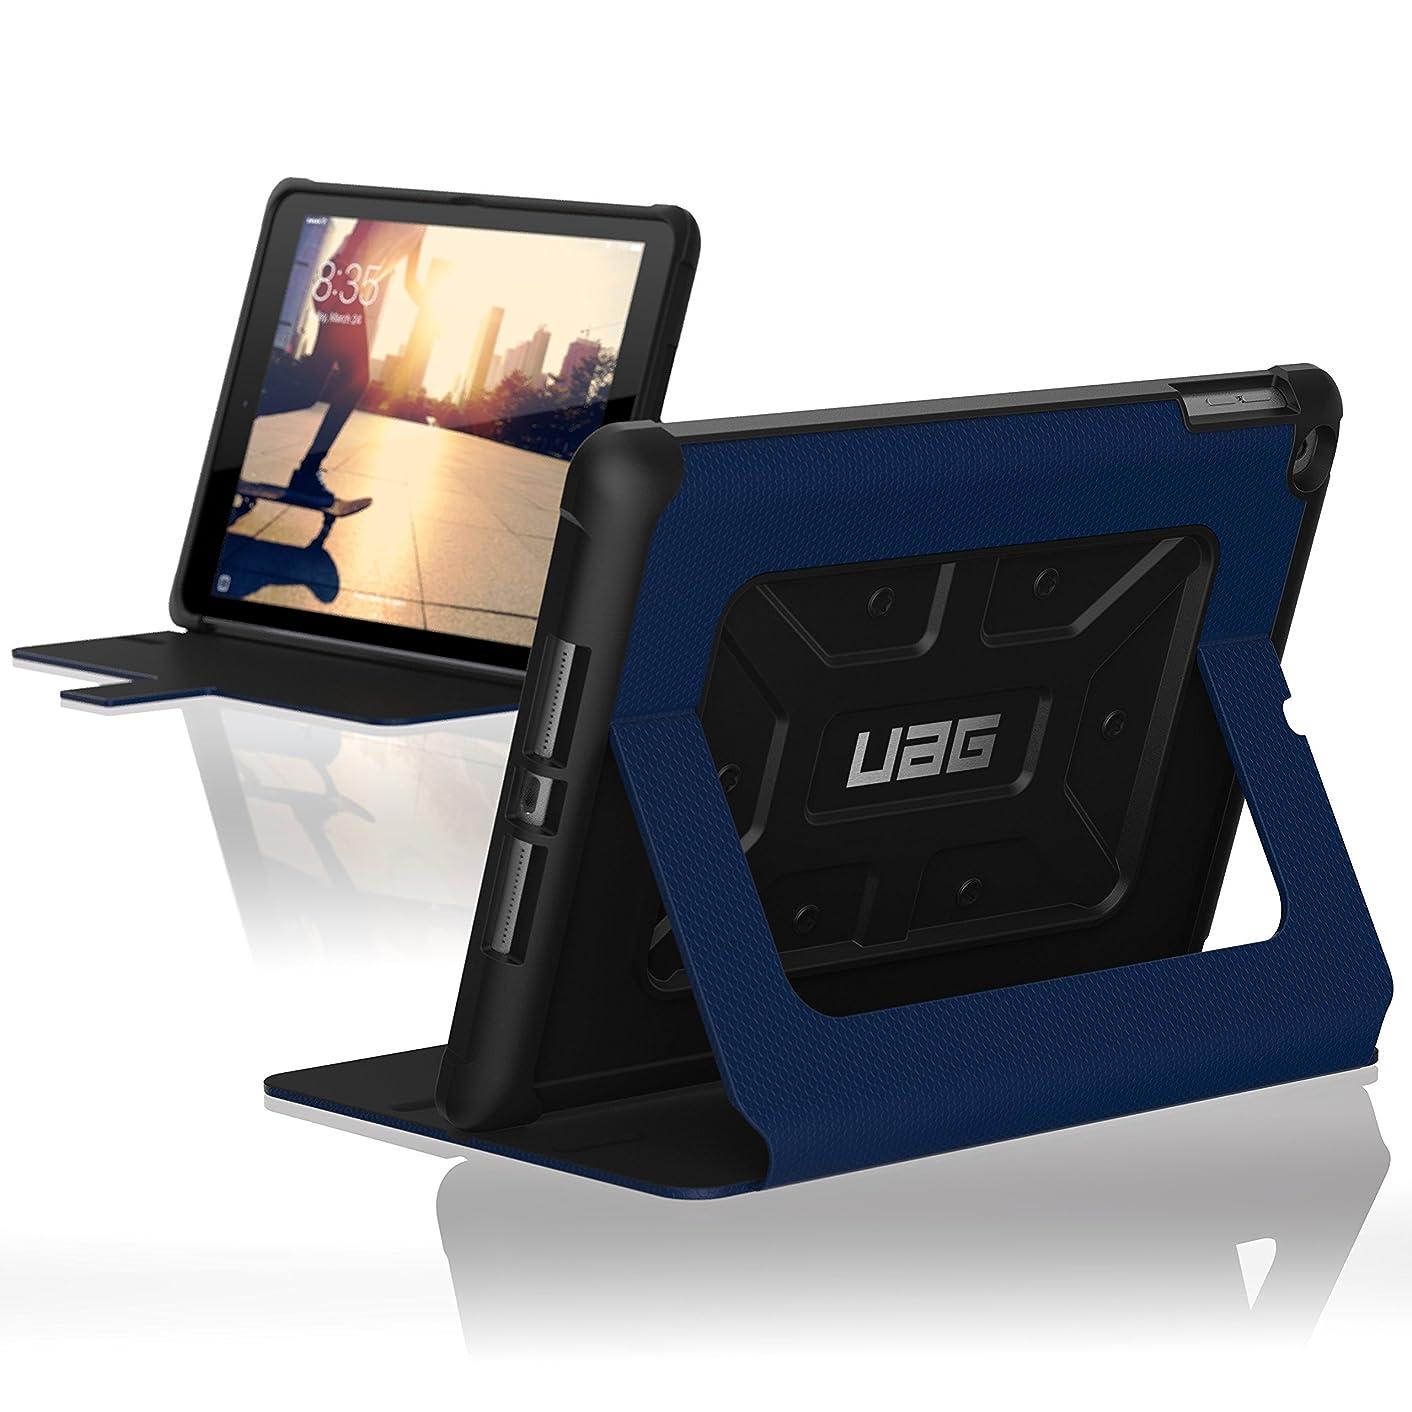 URBAN ARMOR GEAR IPD17-E-CB UAG Folio New iPad (2017, 9.7-inch) Feather-Light Rugged [Cobalt] Military Drop Tested iPad Case